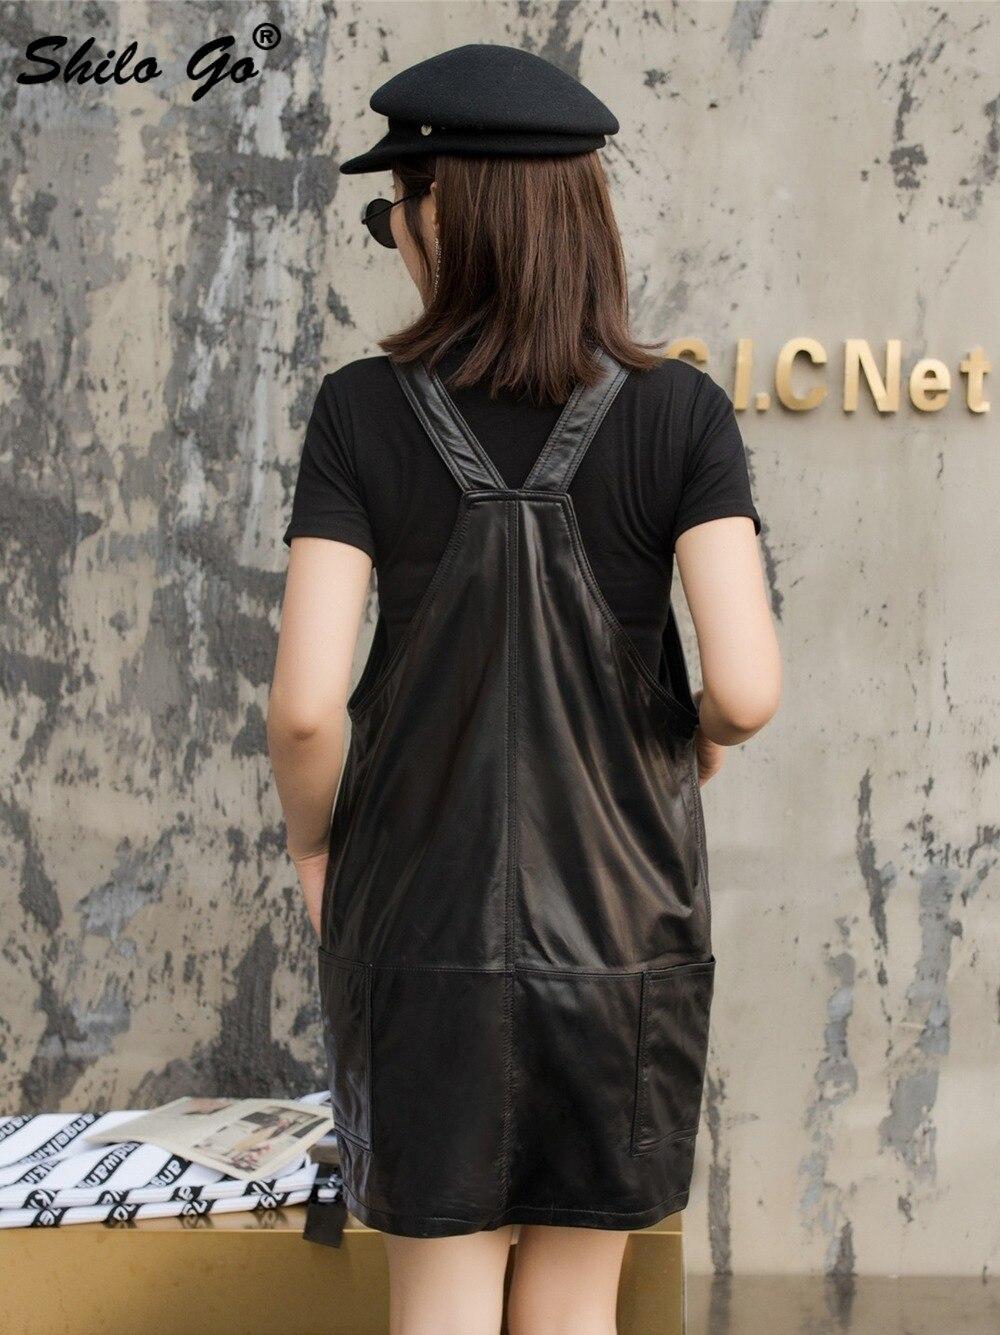 Genuine Leather Dress Black Solid Sleeveless Strap Dress Women Autumn Casual Plus Size Pocket Front Backless Sheepskin Dresses - 6